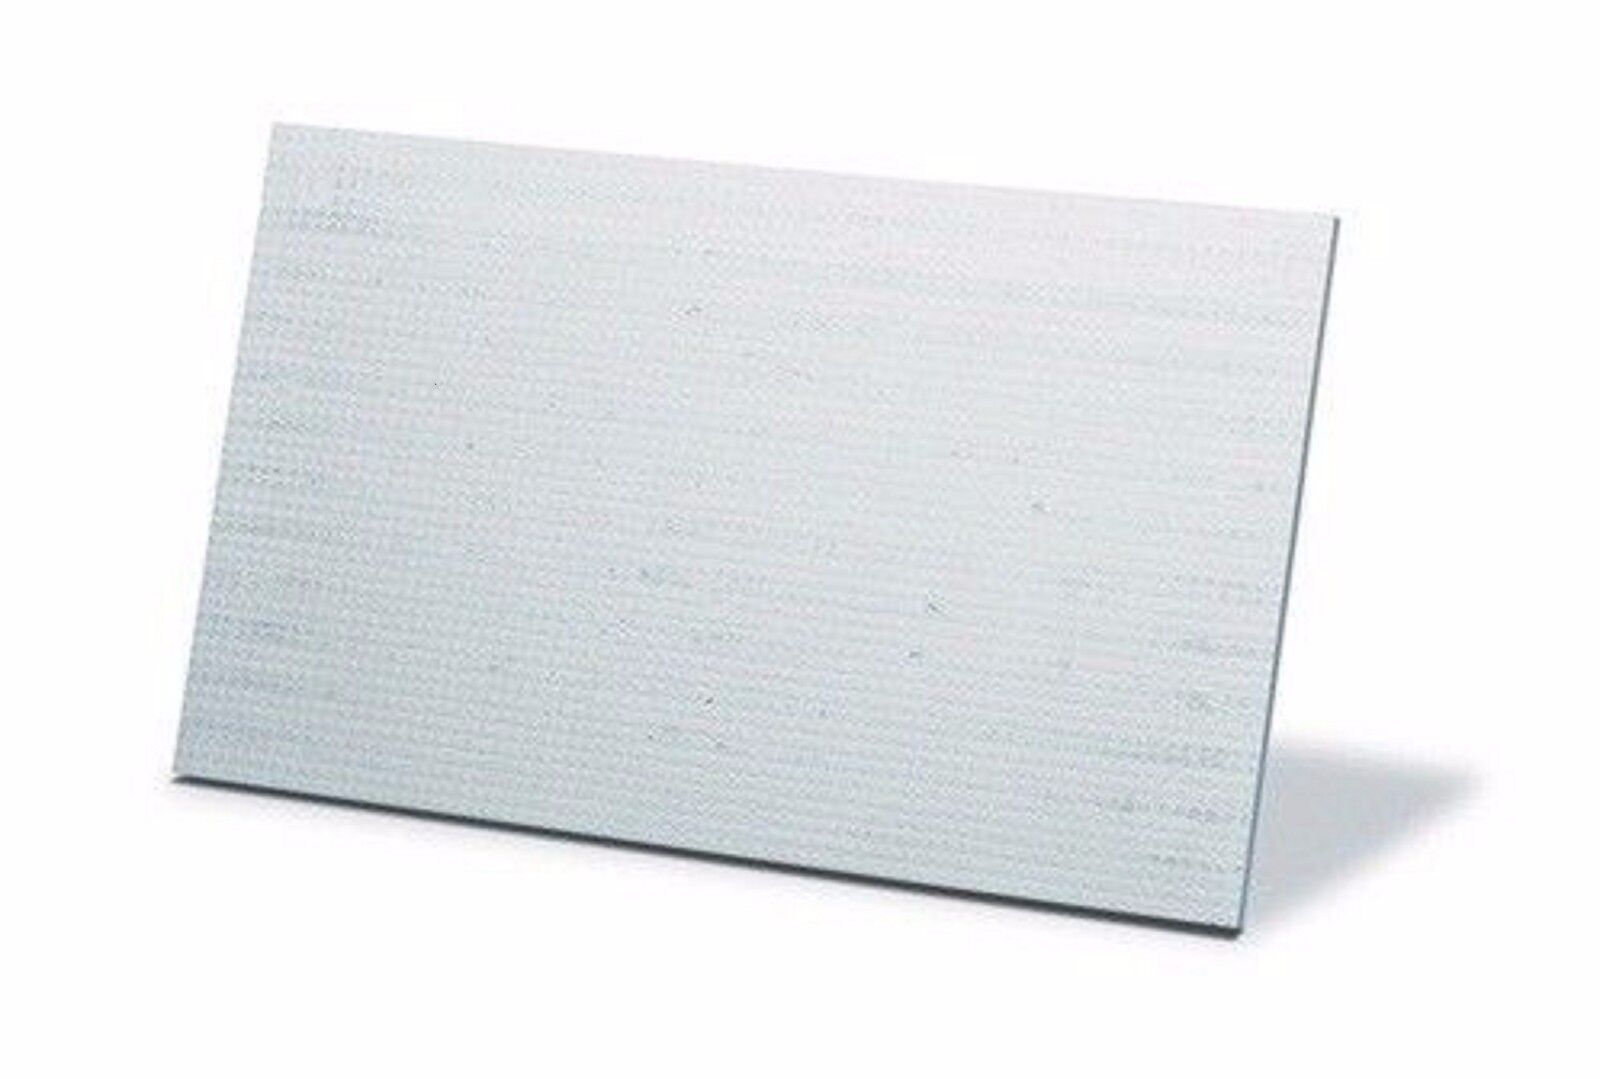 2 x INSULATING BOARDS CALCIUM SILICATE 1000C 610x500x25mm (70625) white